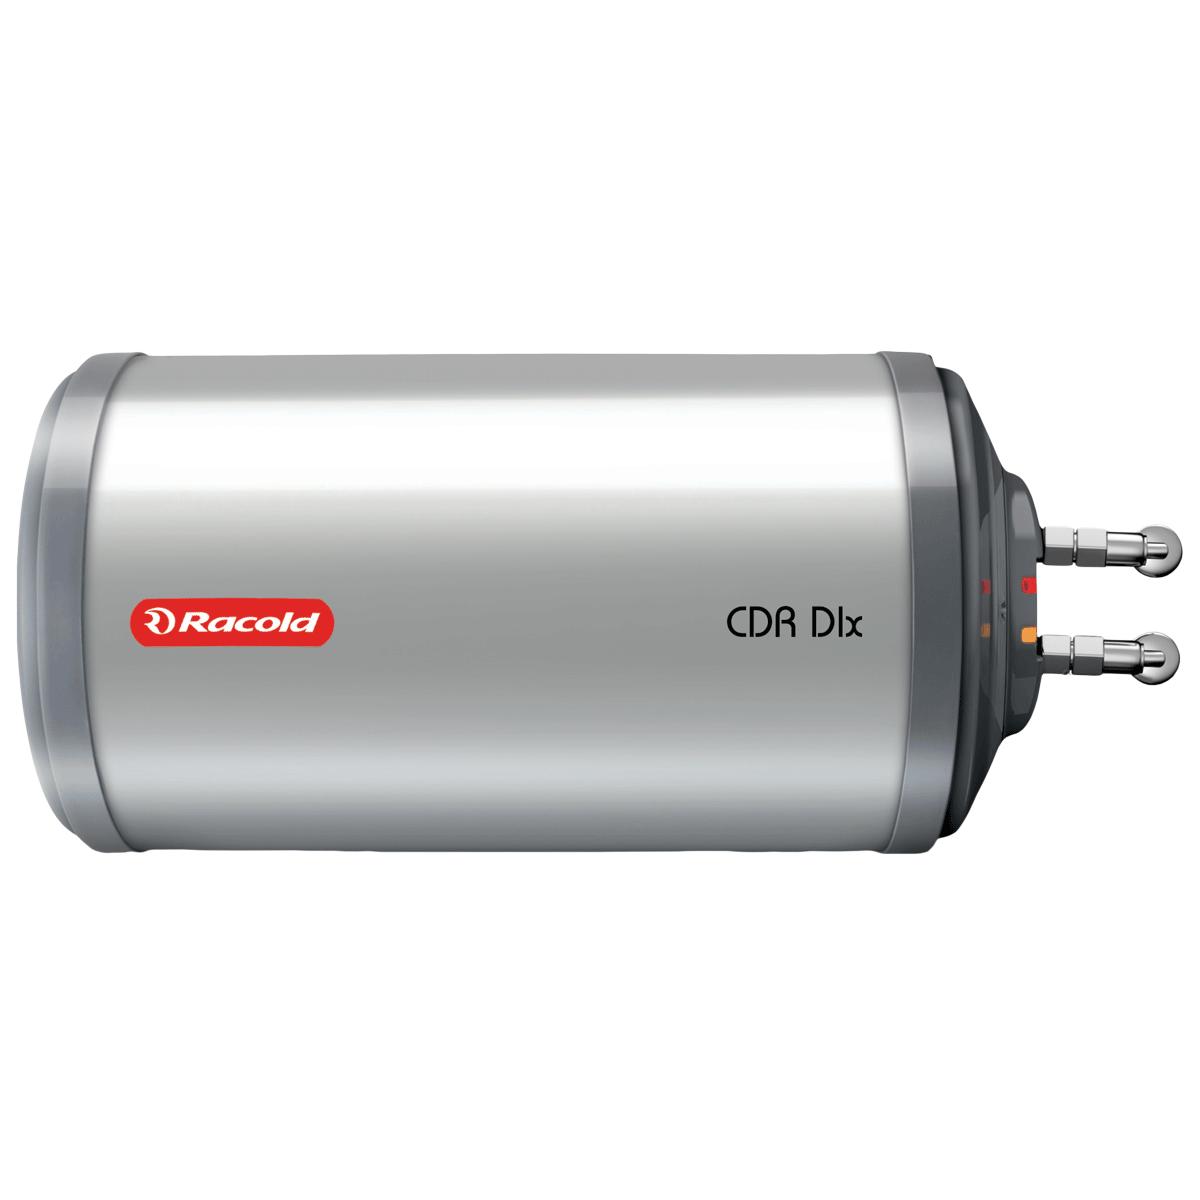 Racold CDR DLX 15 Litres 4 Star Storage Water Geyser (2000 Watts, LHS Water Inlet, White)_1